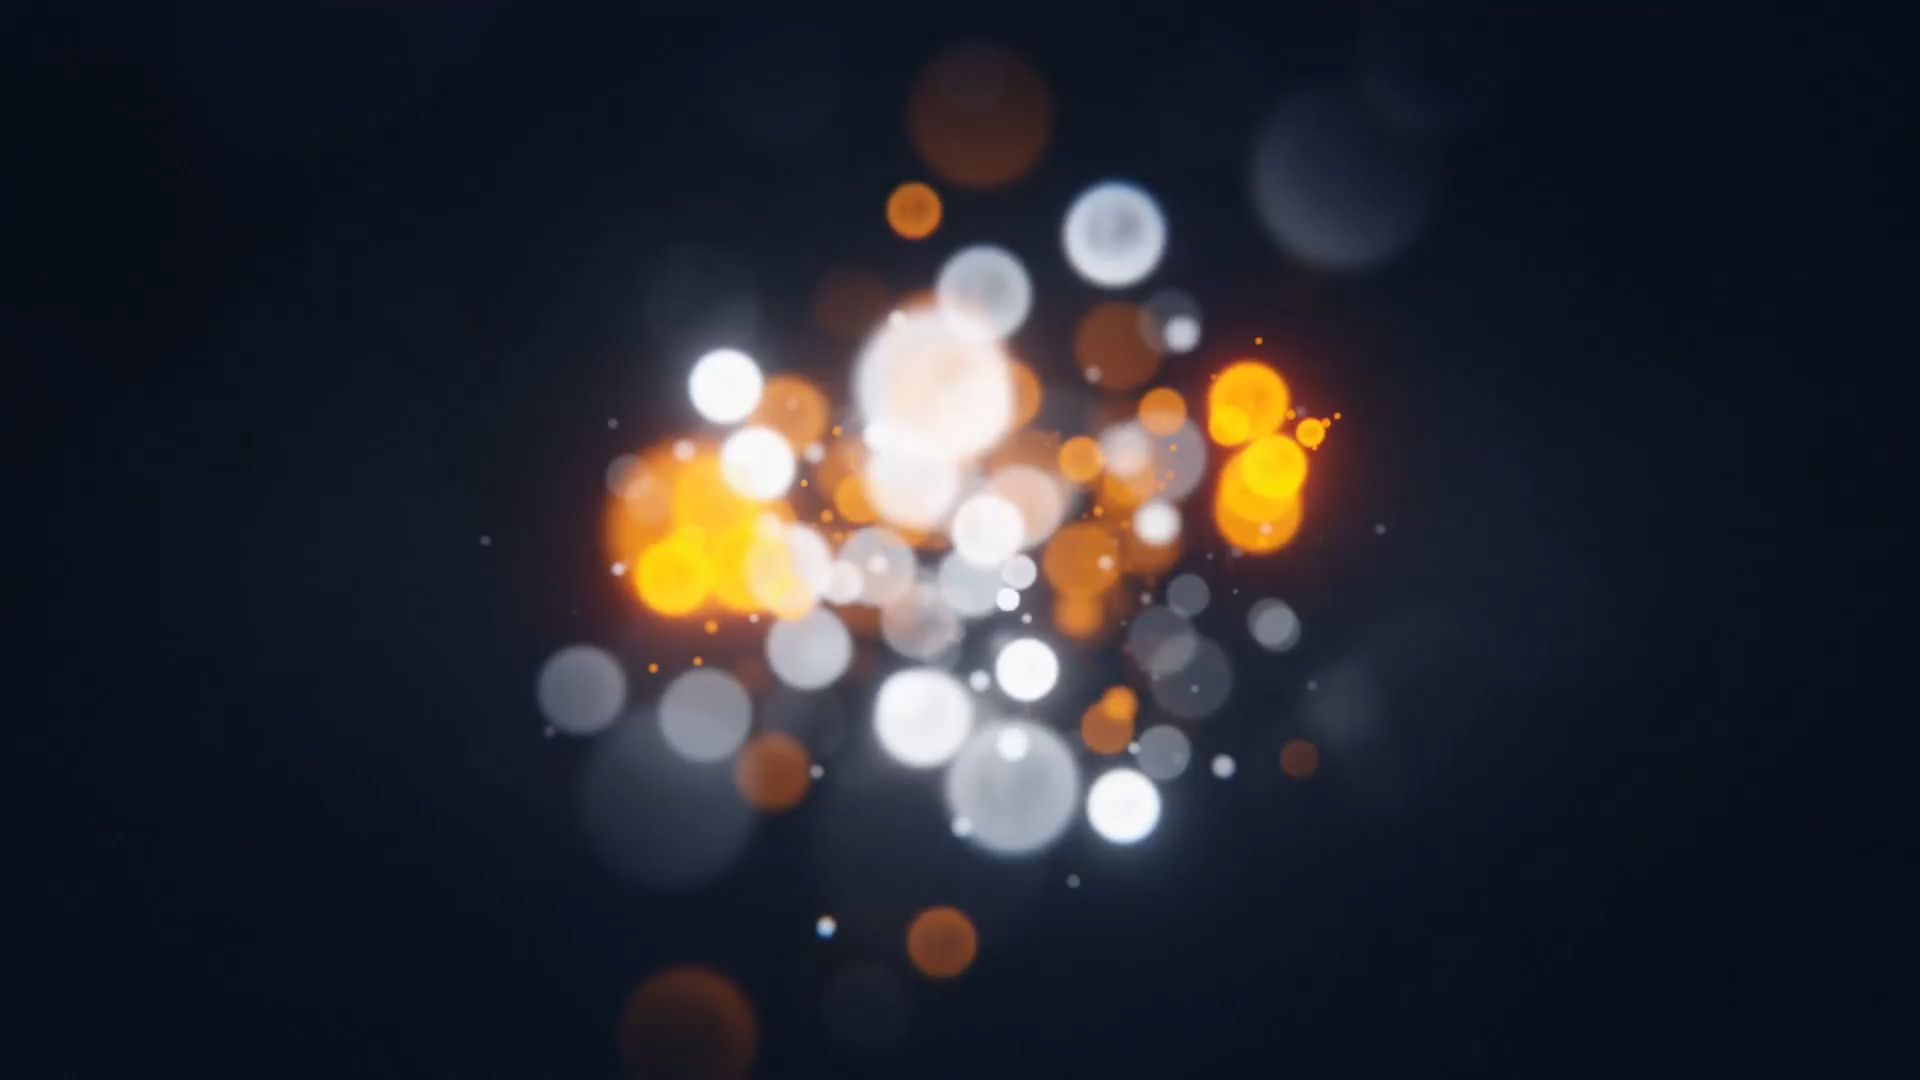 VIDDYOZE-Atmospheric Bokeh Particles Intro